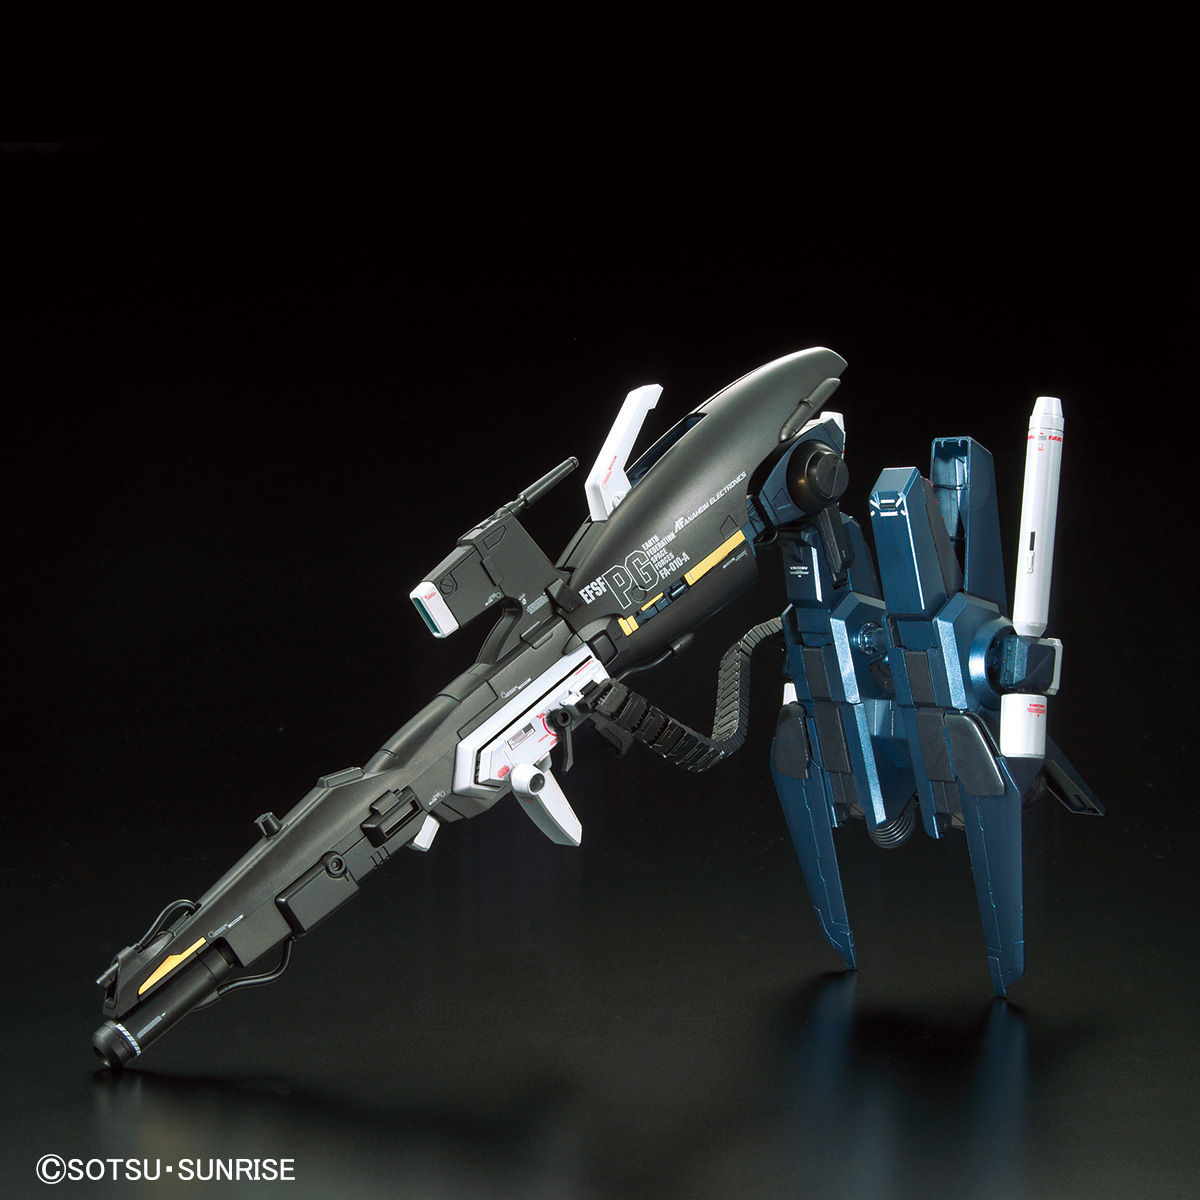 MG 1/100 ガンダムベース限定 FAZZ Ver.Ka[チタニウムフィニッシュ] 商品画像